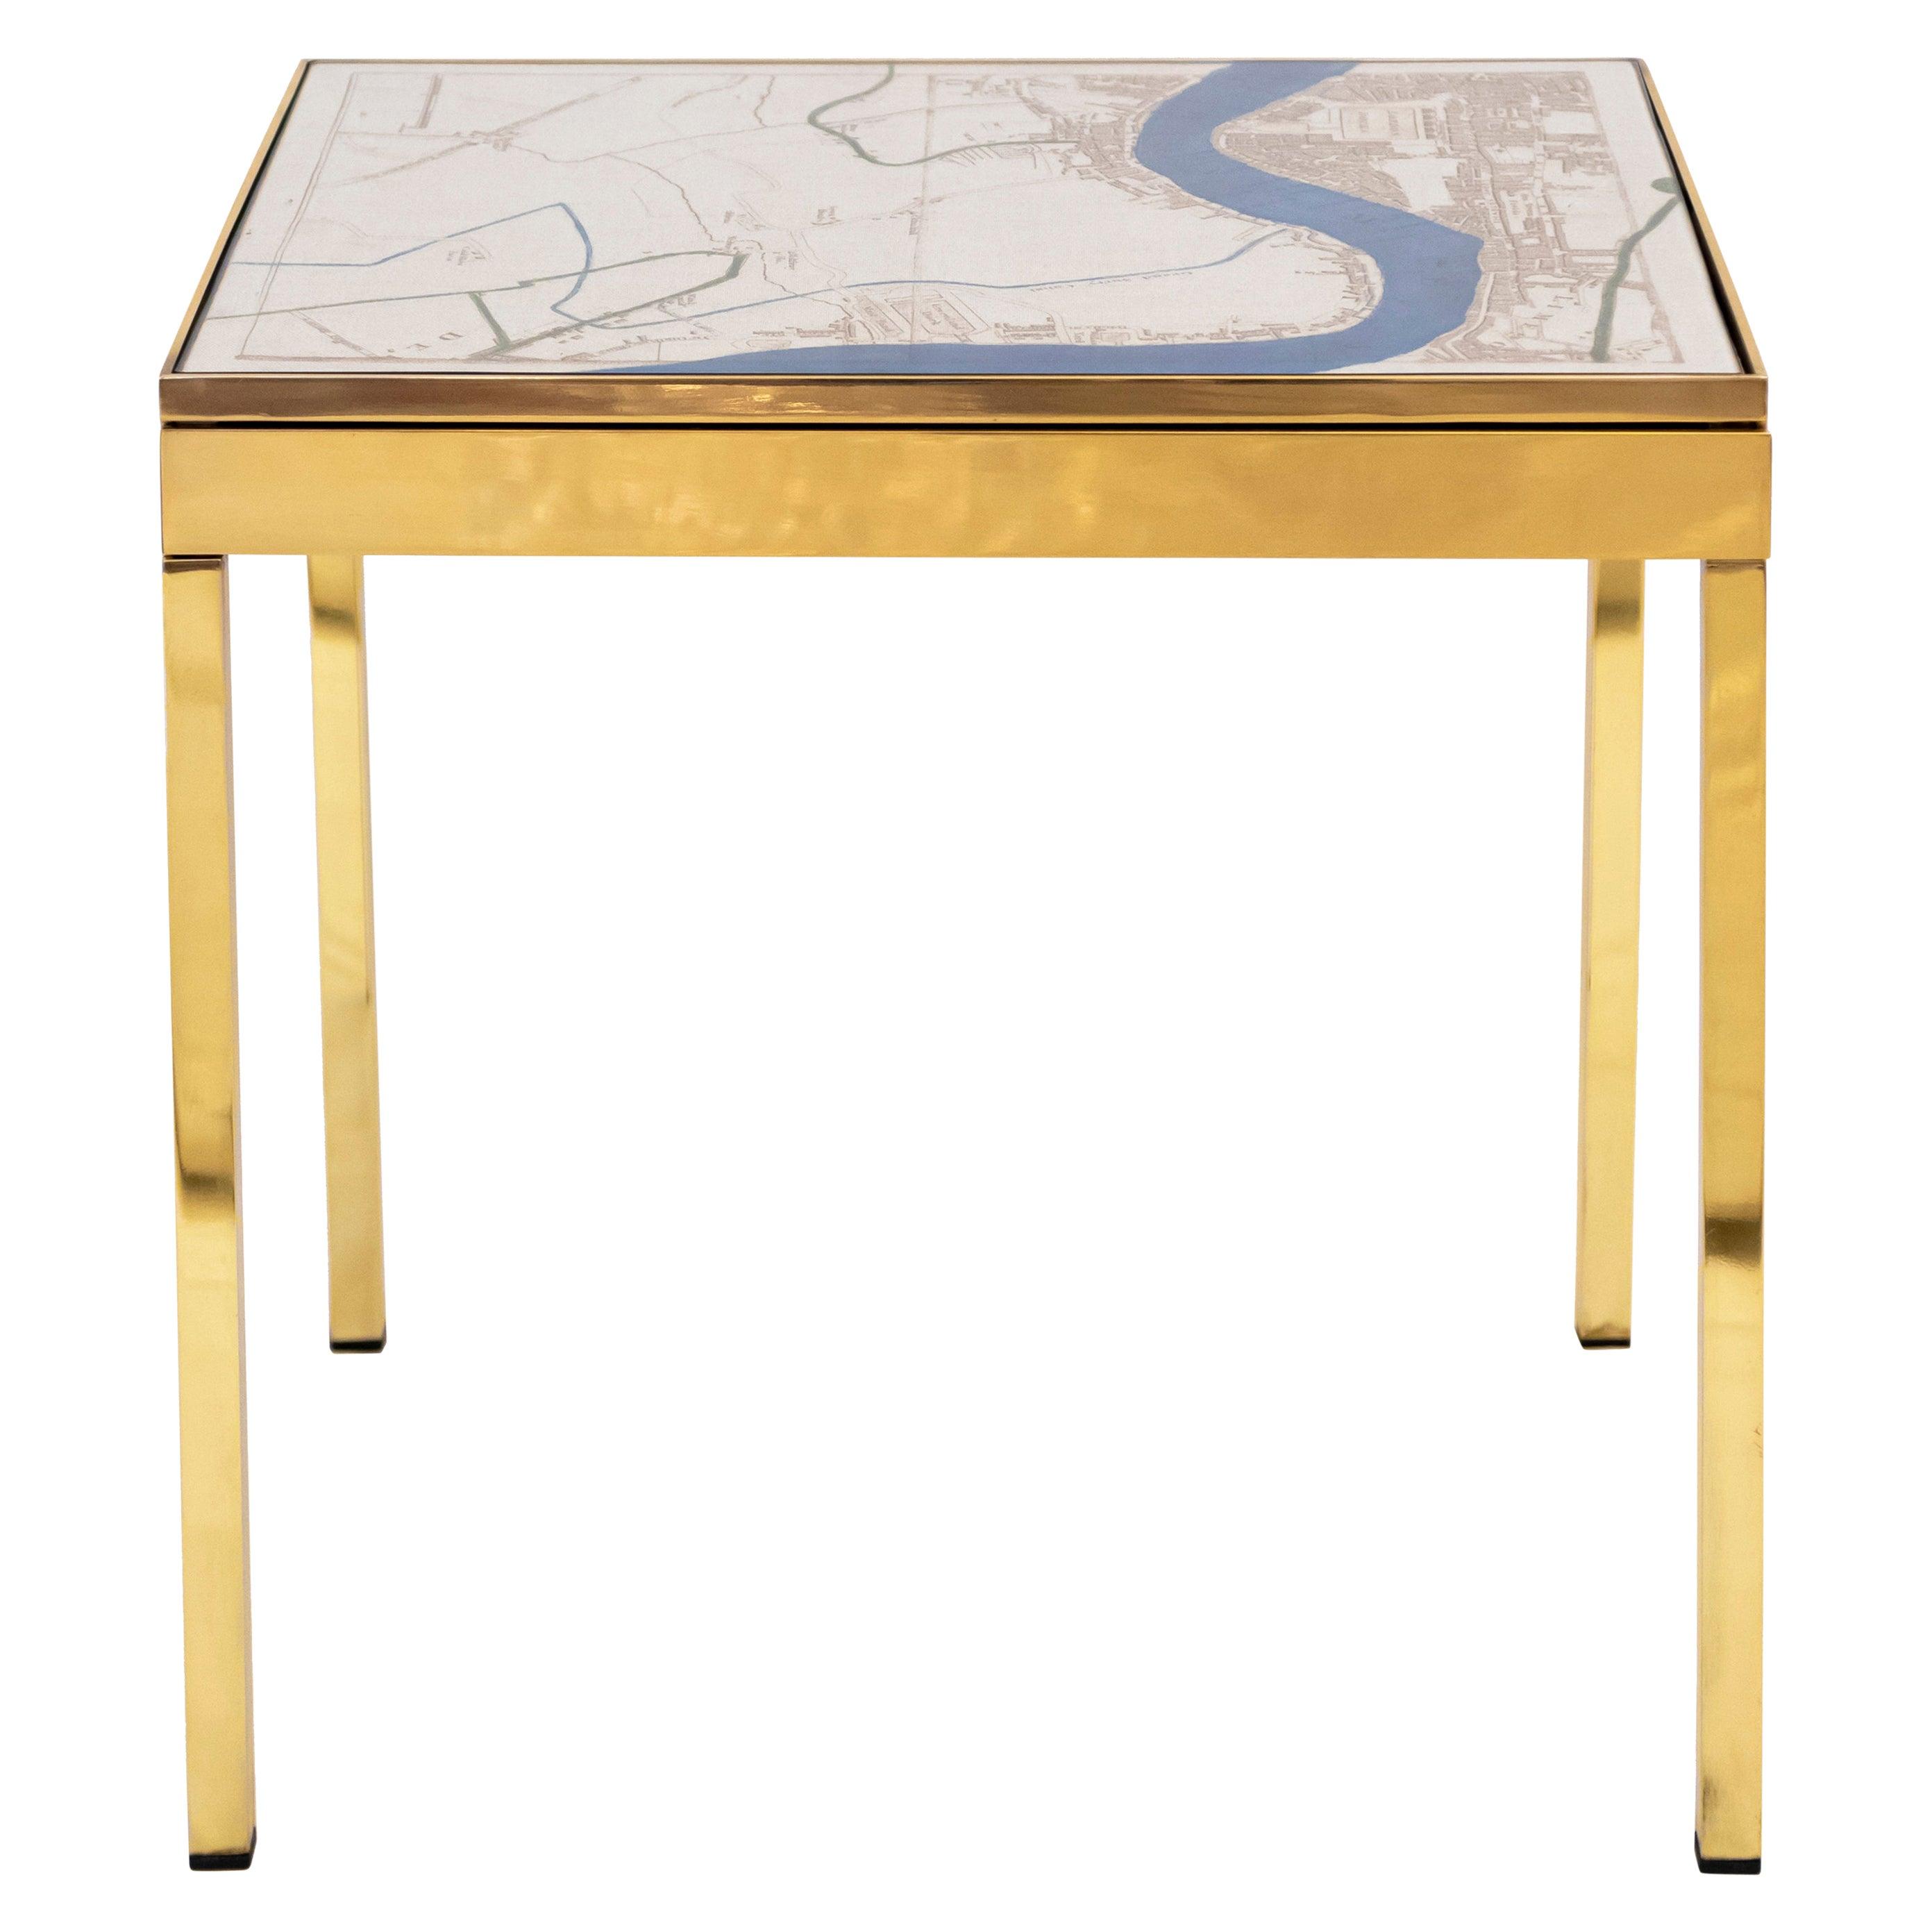 Iris London I Brass Bedside Table by Allegra Hicks